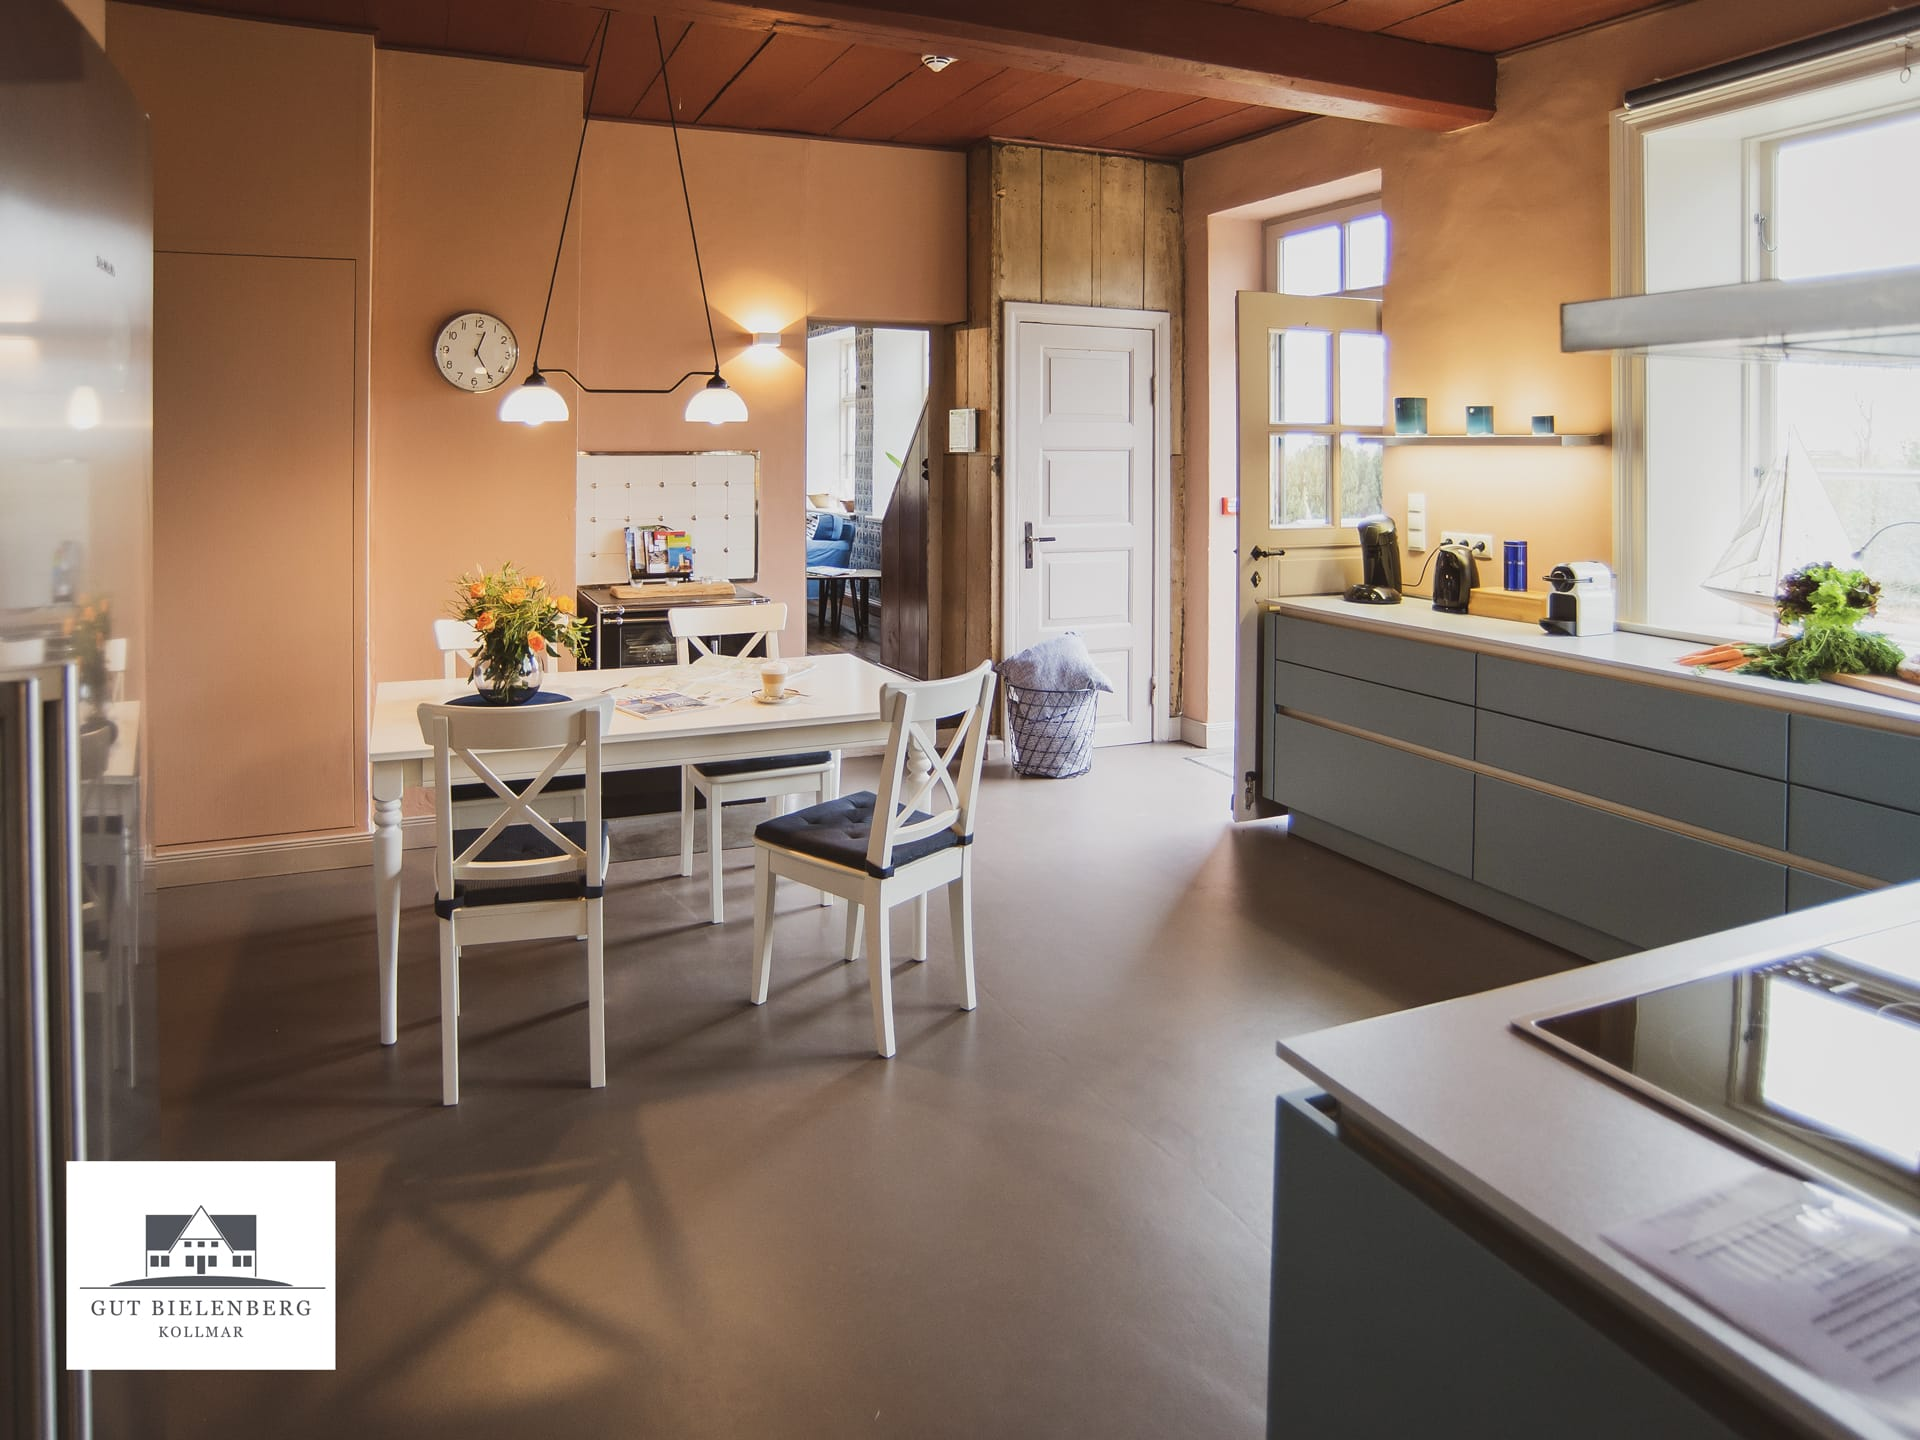 Gut Bielenberg - Suite Döns